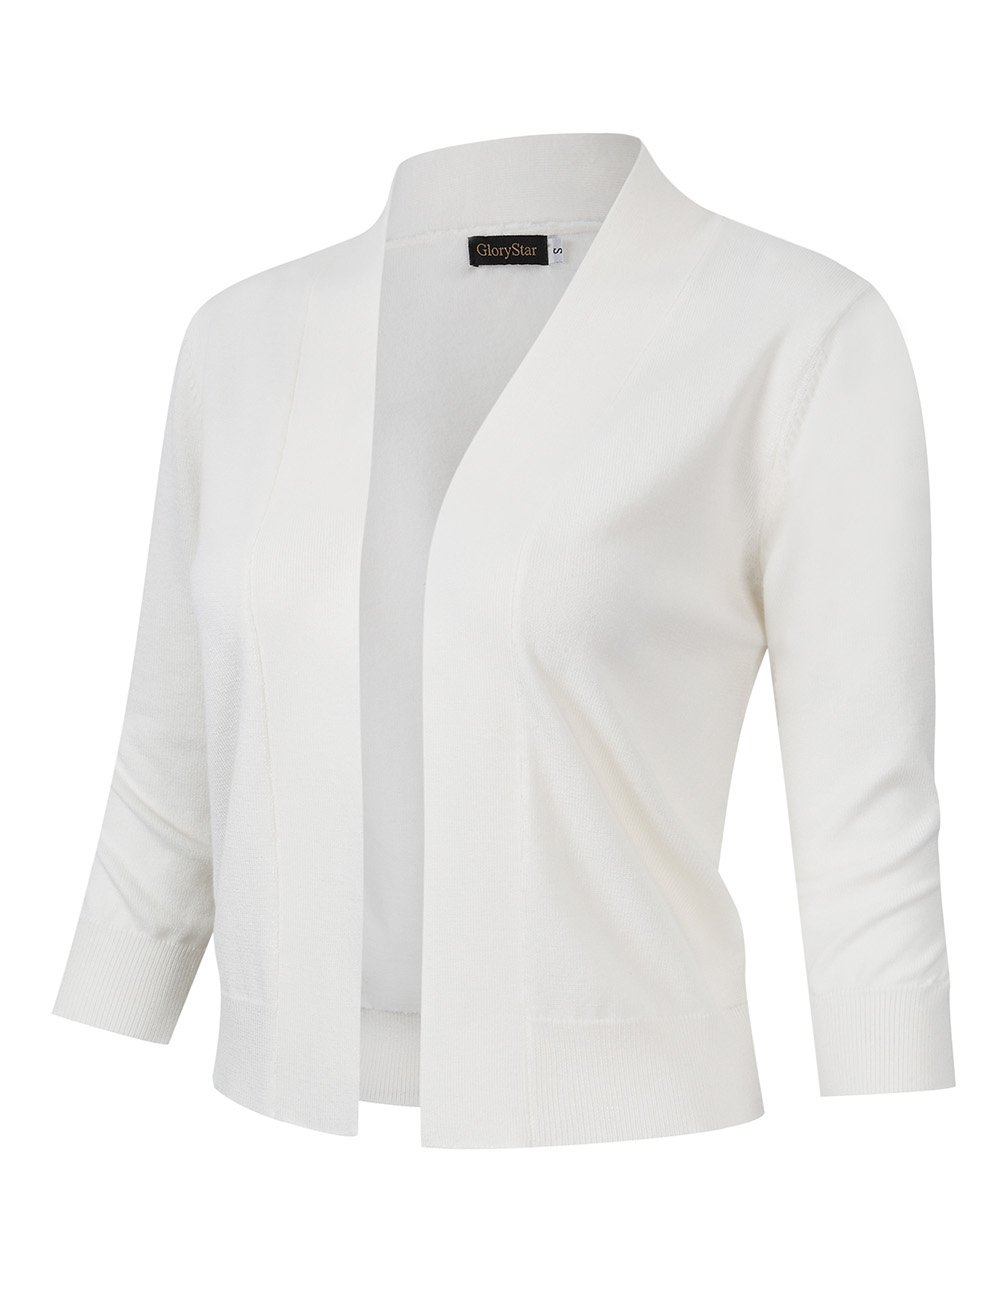 GloryStar Women's 3/4 Sleeve Open Front Lightweight Knit Cropped Cardigan Sweater White M